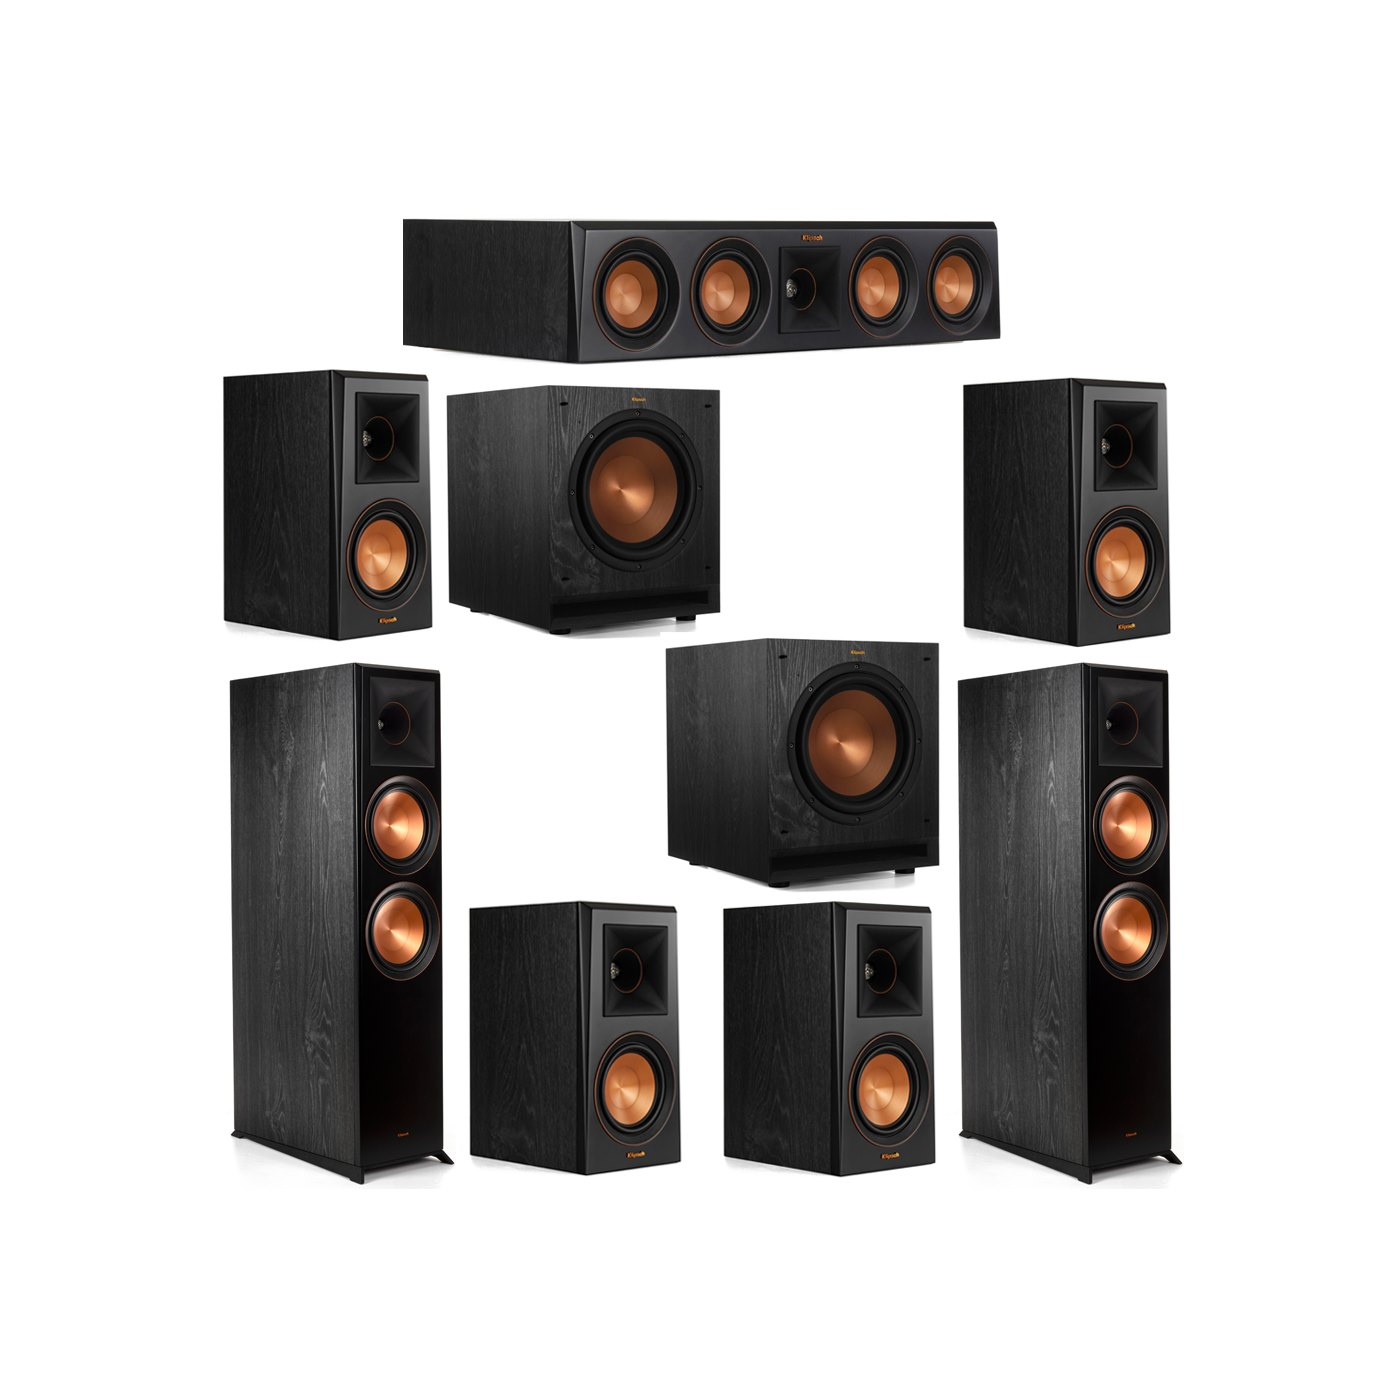 Klipsch 7.2 System with 2 RP-8000F Floorstanding Speakers, 1 Klipsch RP-404C Center Speaker, 4 Klipsch RP-500M Surround Speakers, 2 Klipsch SPL-100 Subwoofers